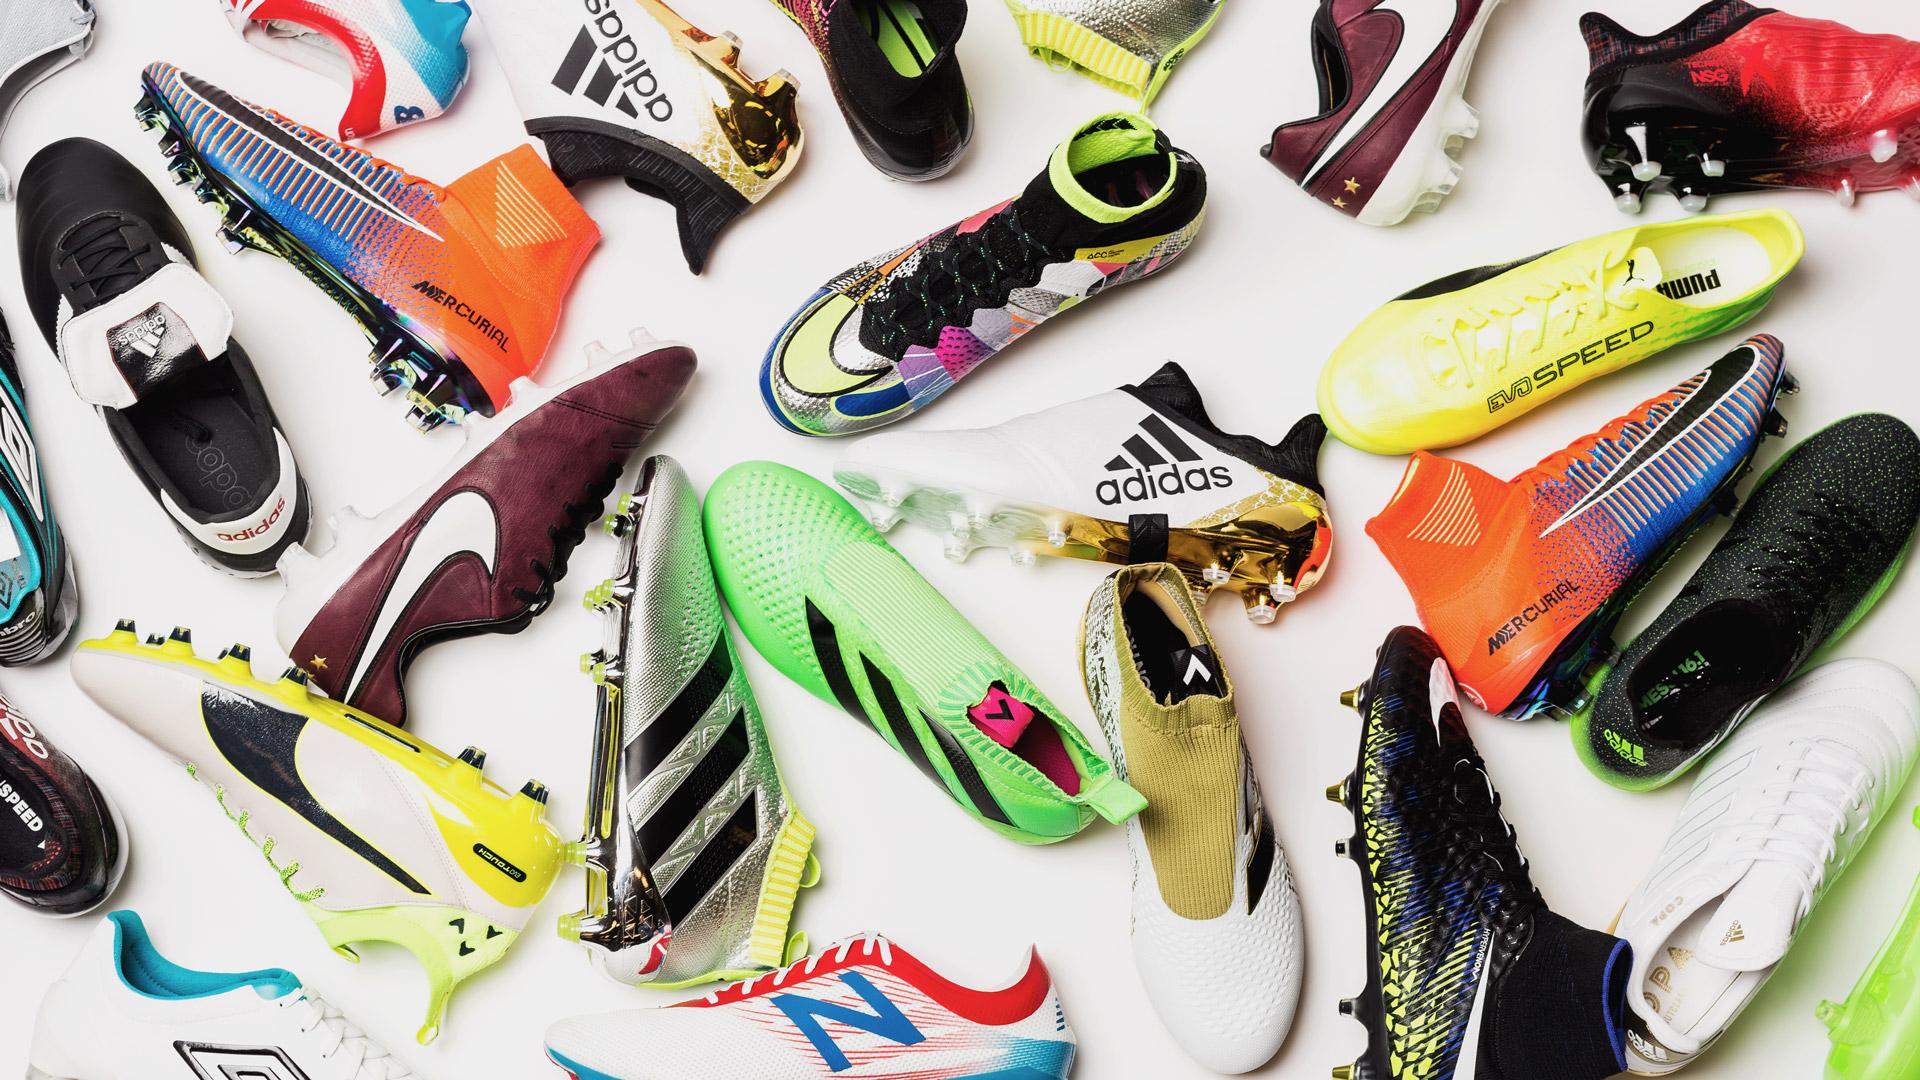 70134b4db30e The 10 best sickest football boots of 2016